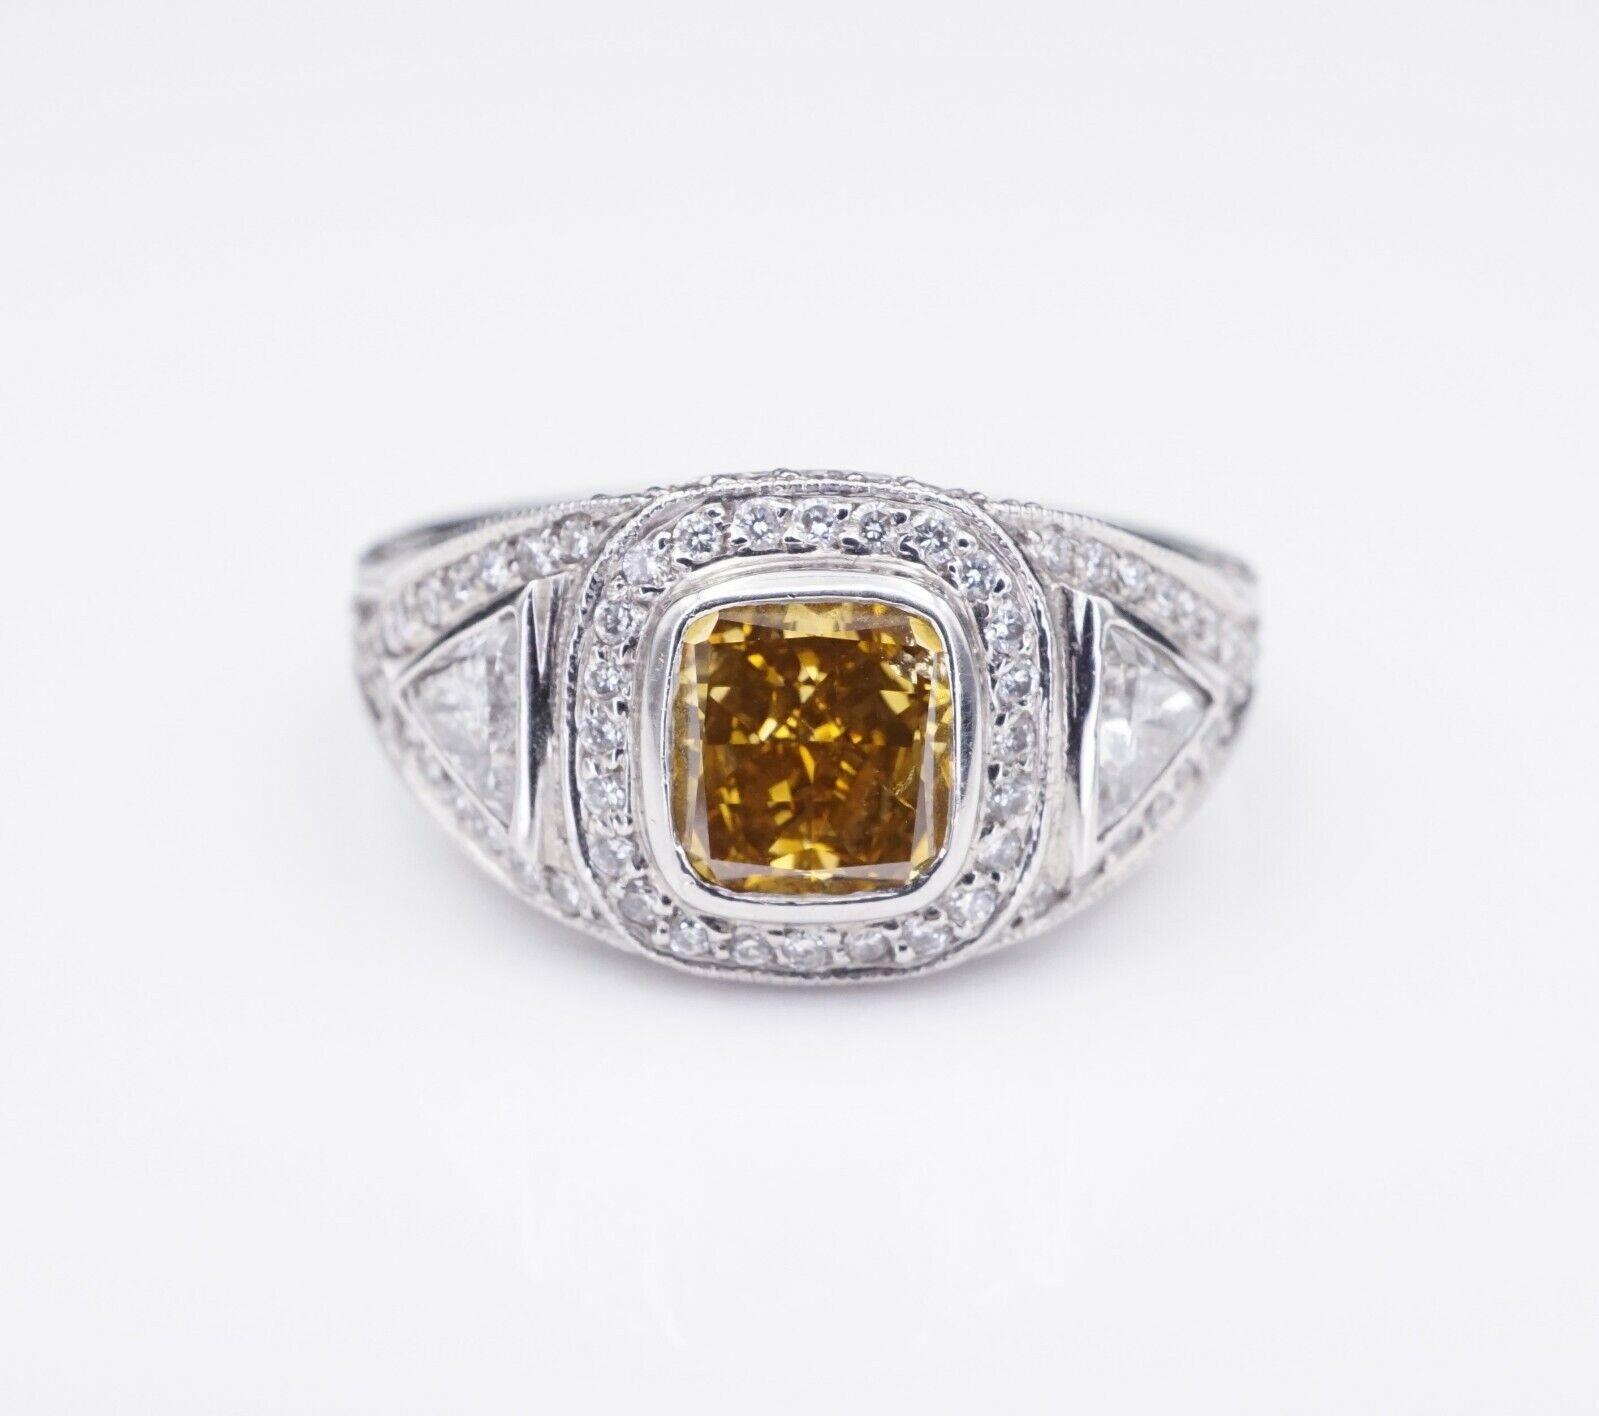 Platinum 3ct Orange-Yellow Diamond Halo Engagement Ring Size 6.75 GIA CO450